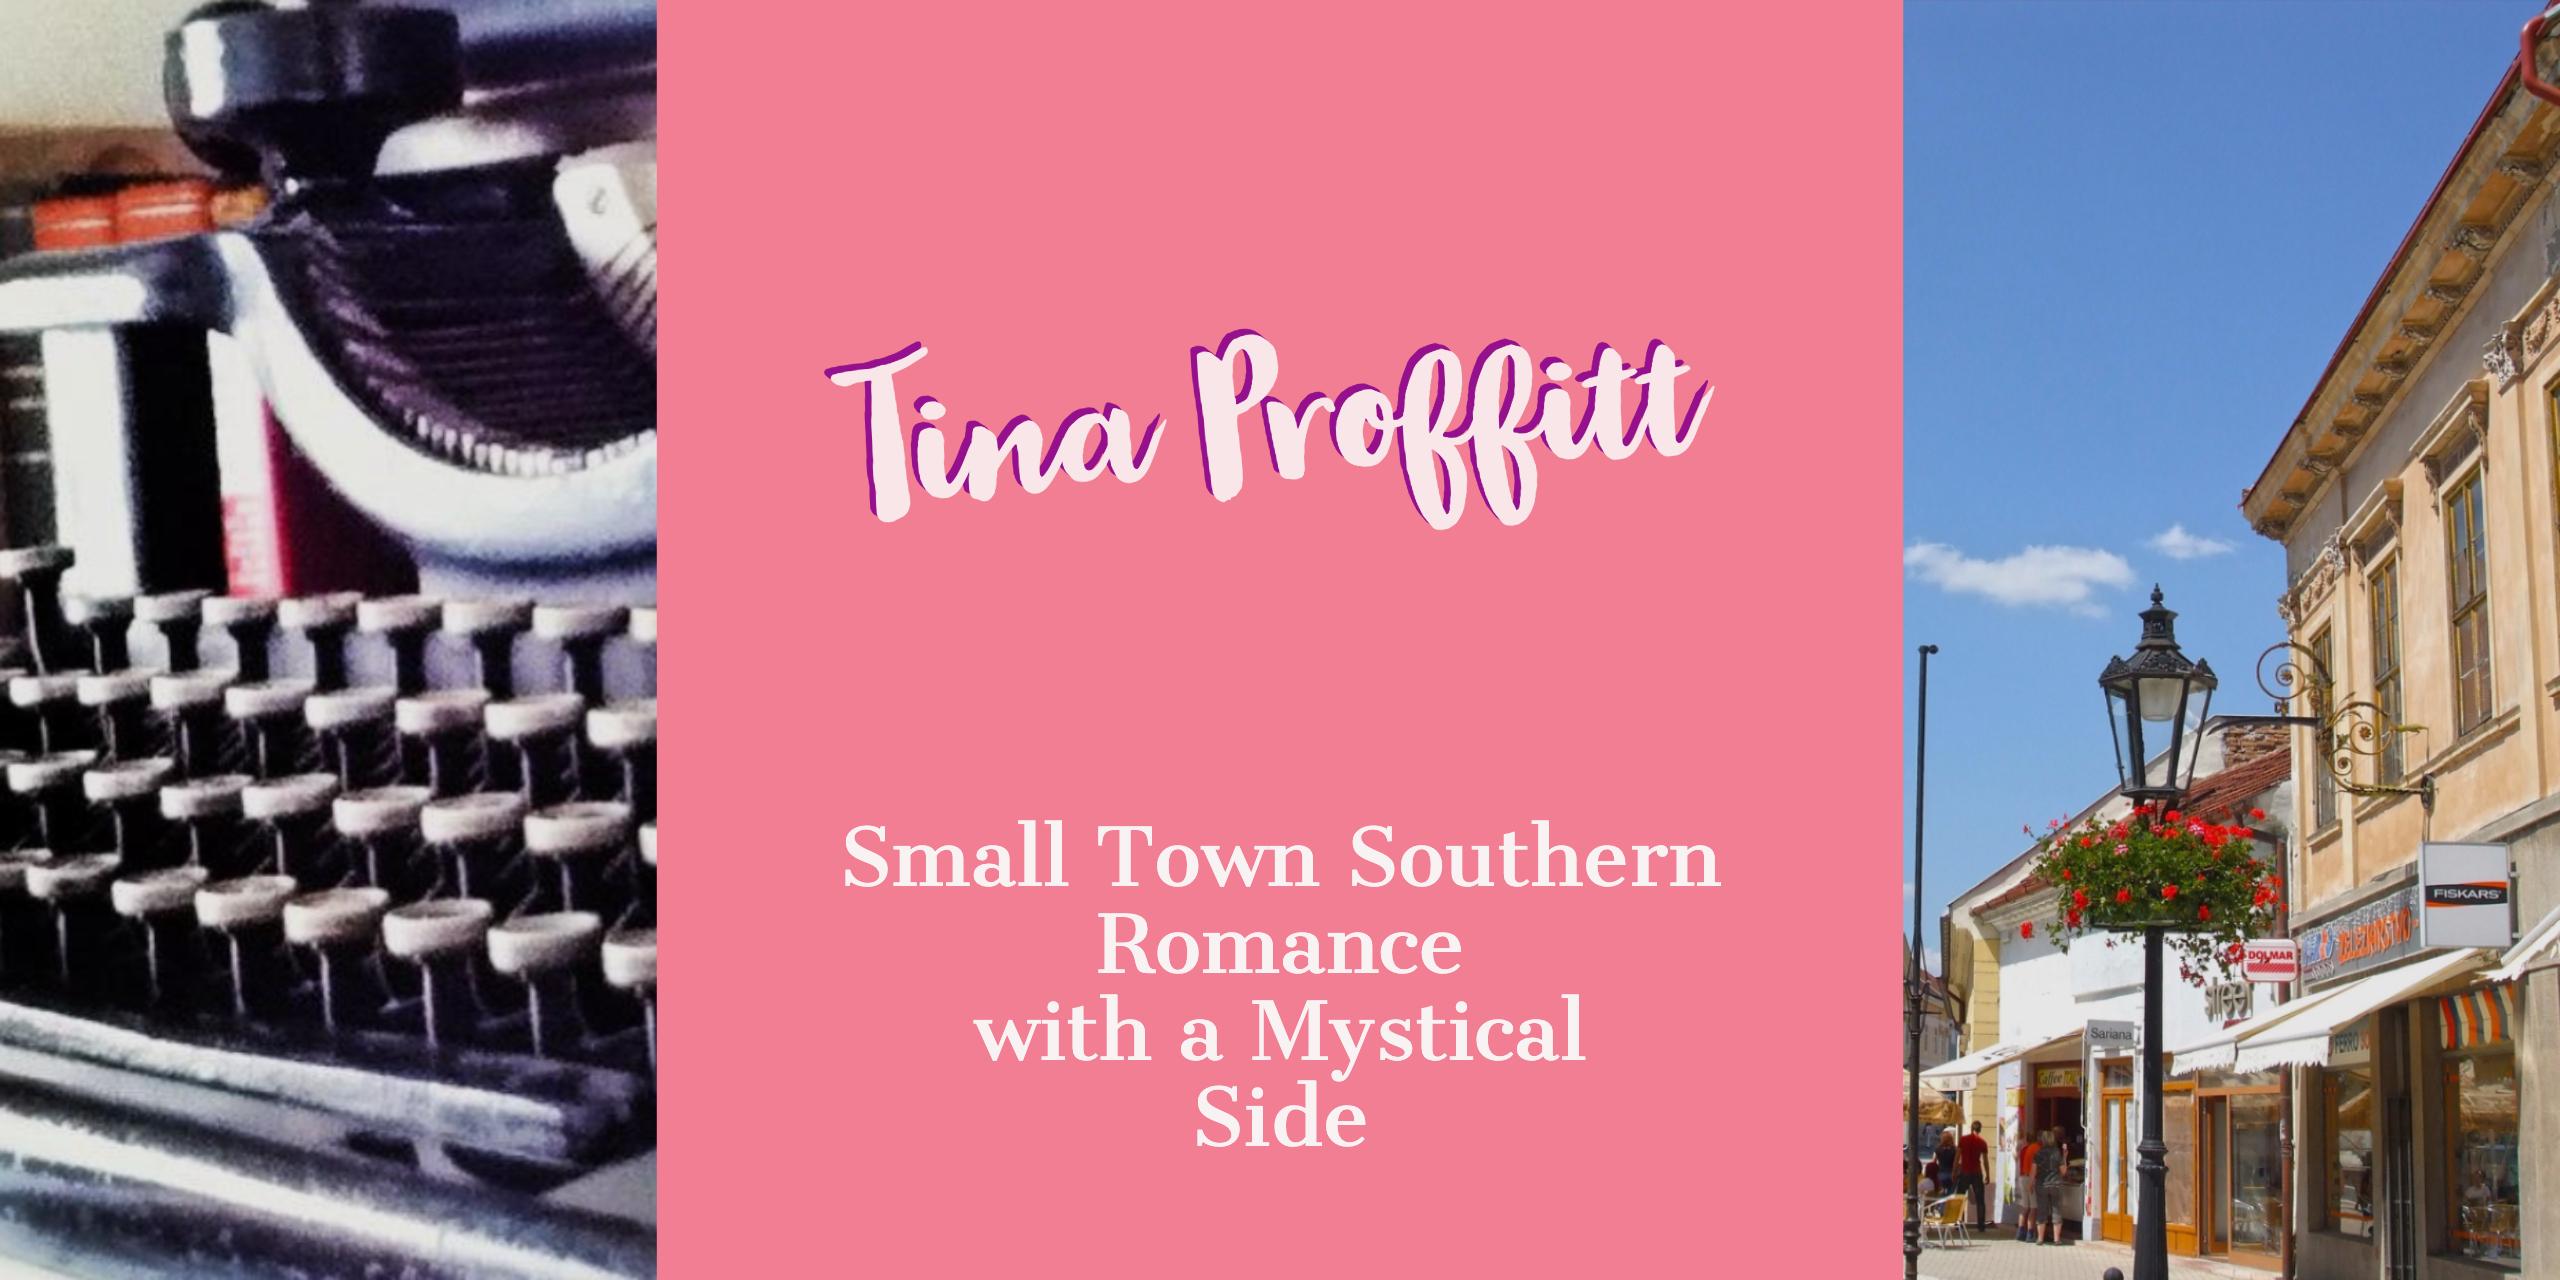 Tina Proffitt